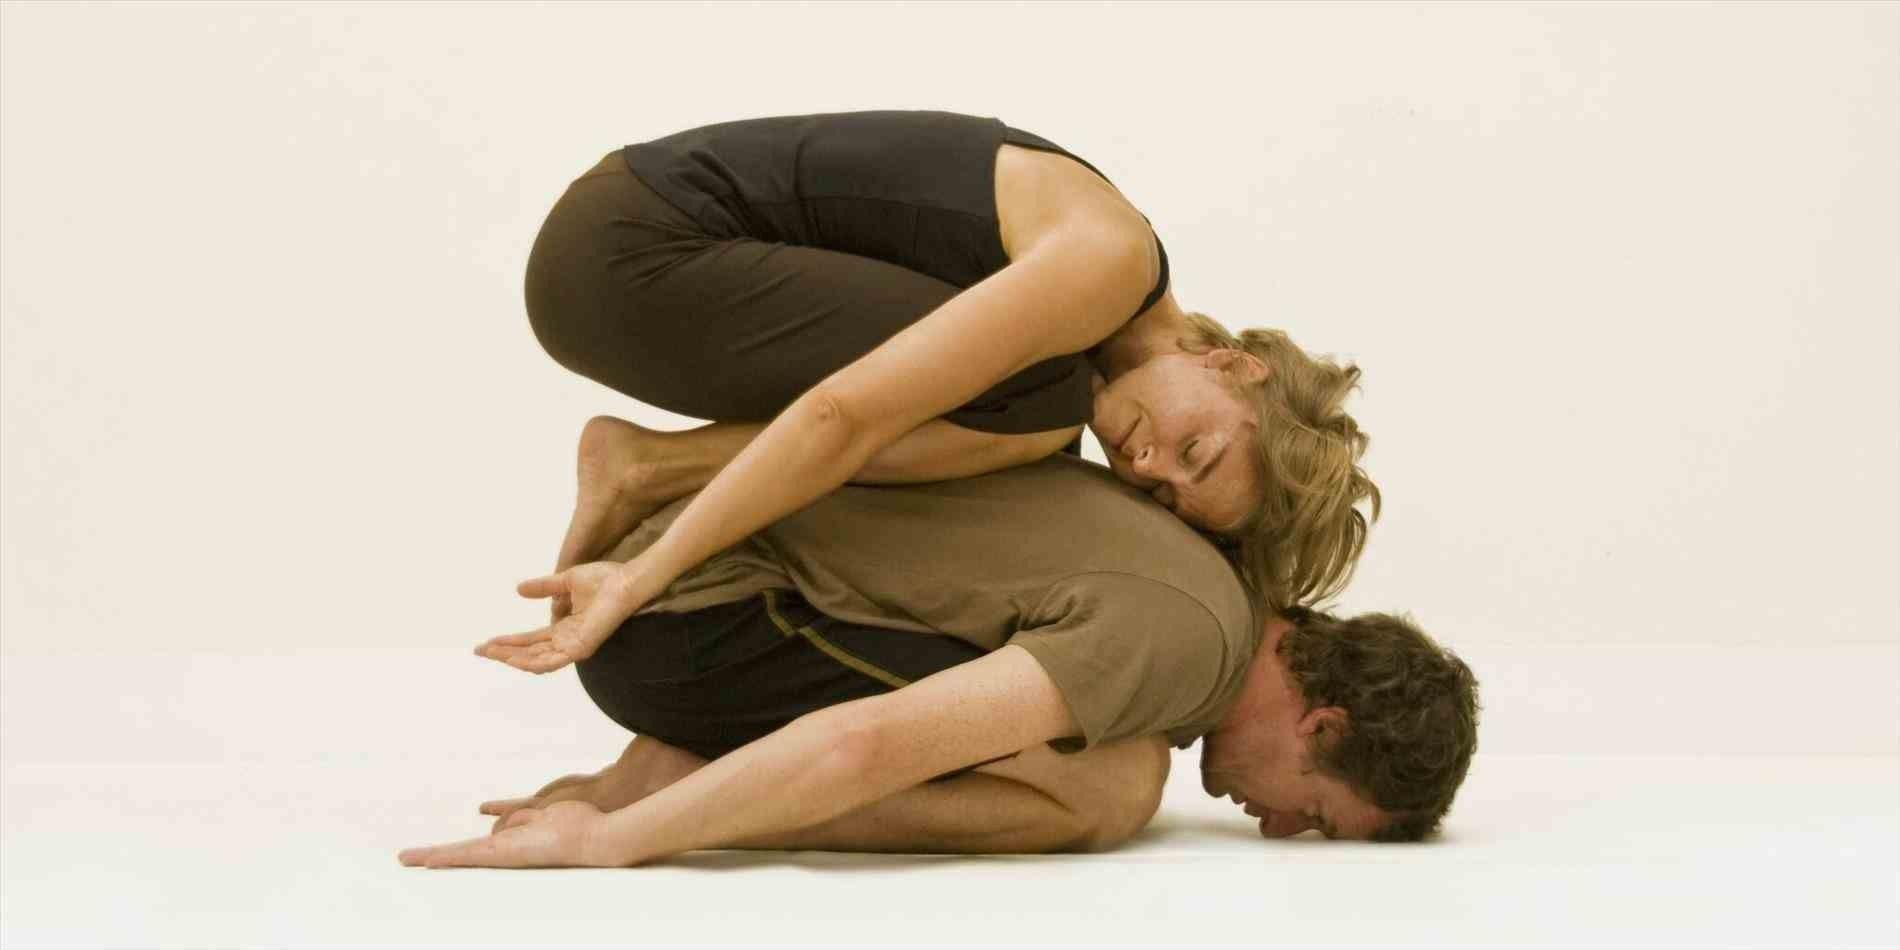 Yoga Poses For Couples Beginner